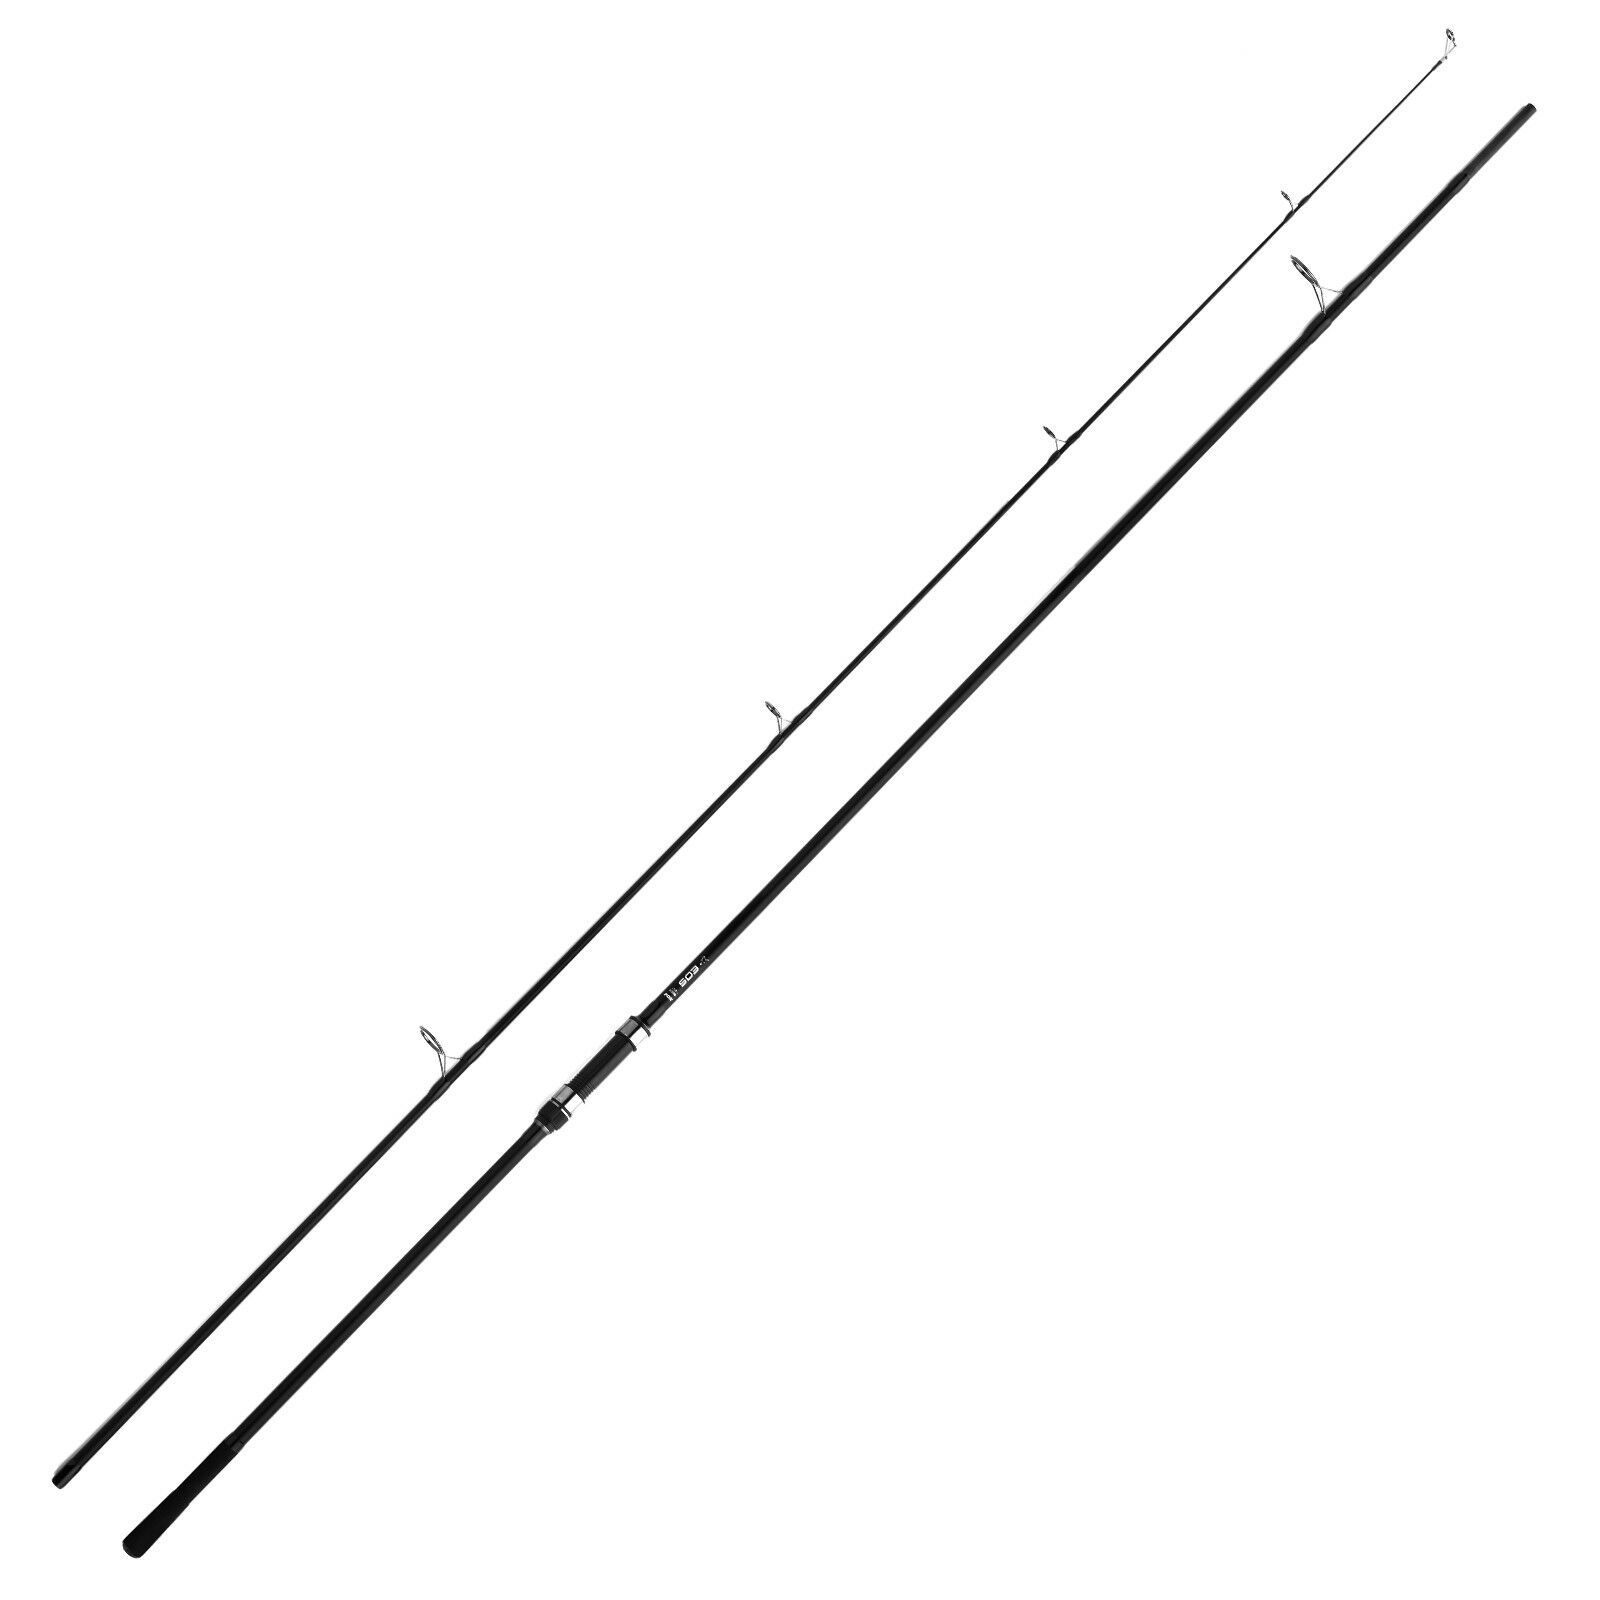 Fox Angelrute Karpfenrute - Rute EOS 12ft 3lb 2pc